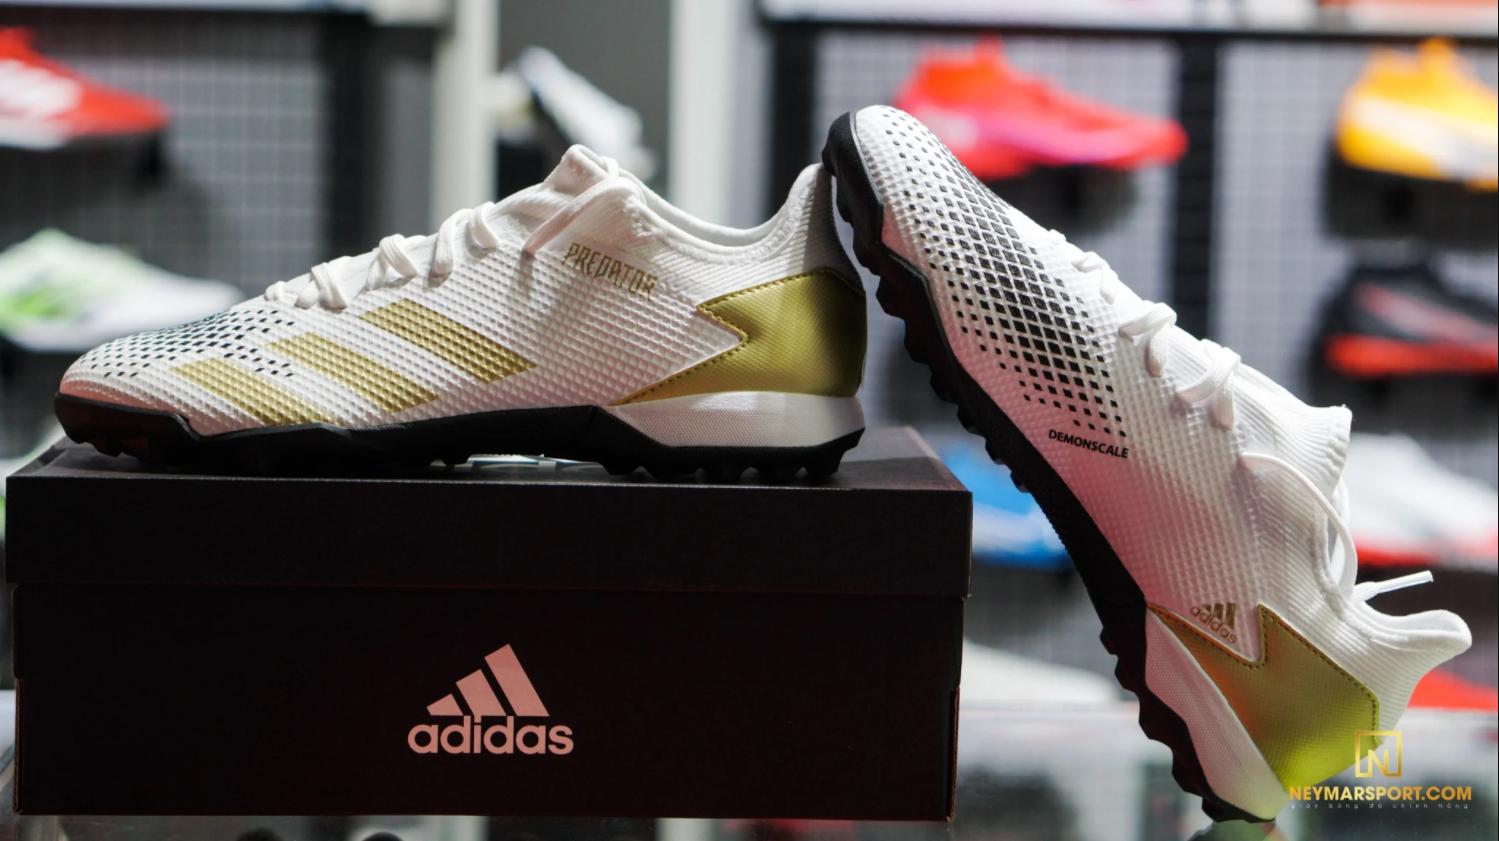 Vẻ đẹp của của adidas Predator 20.3 Low TF Inflight